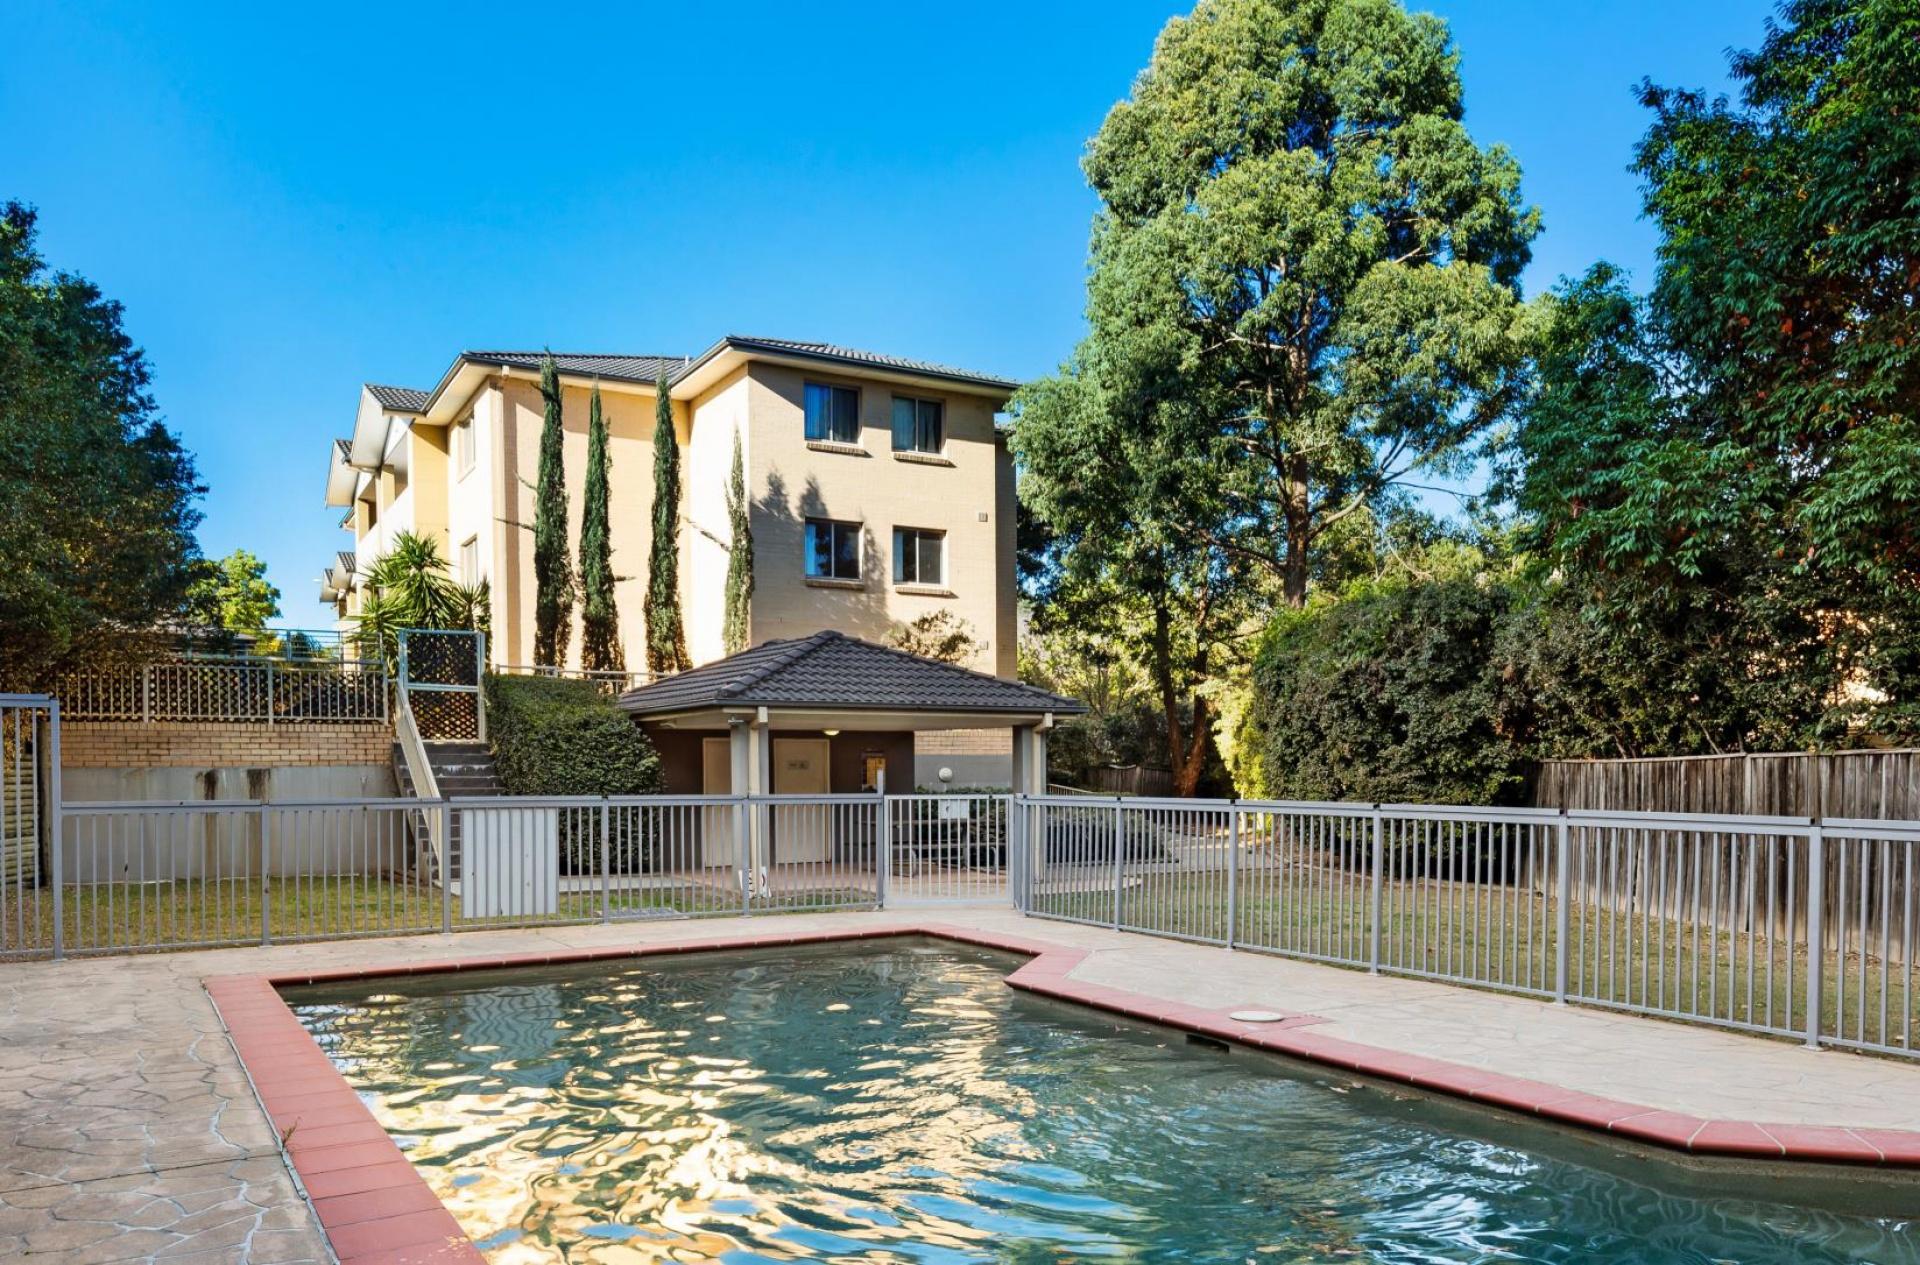 2 Bedrooms, Apartment, Leased, Mercer Street, 2 Bathrooms, Listing ID 1319, Castle Hill, NSW, Australia,